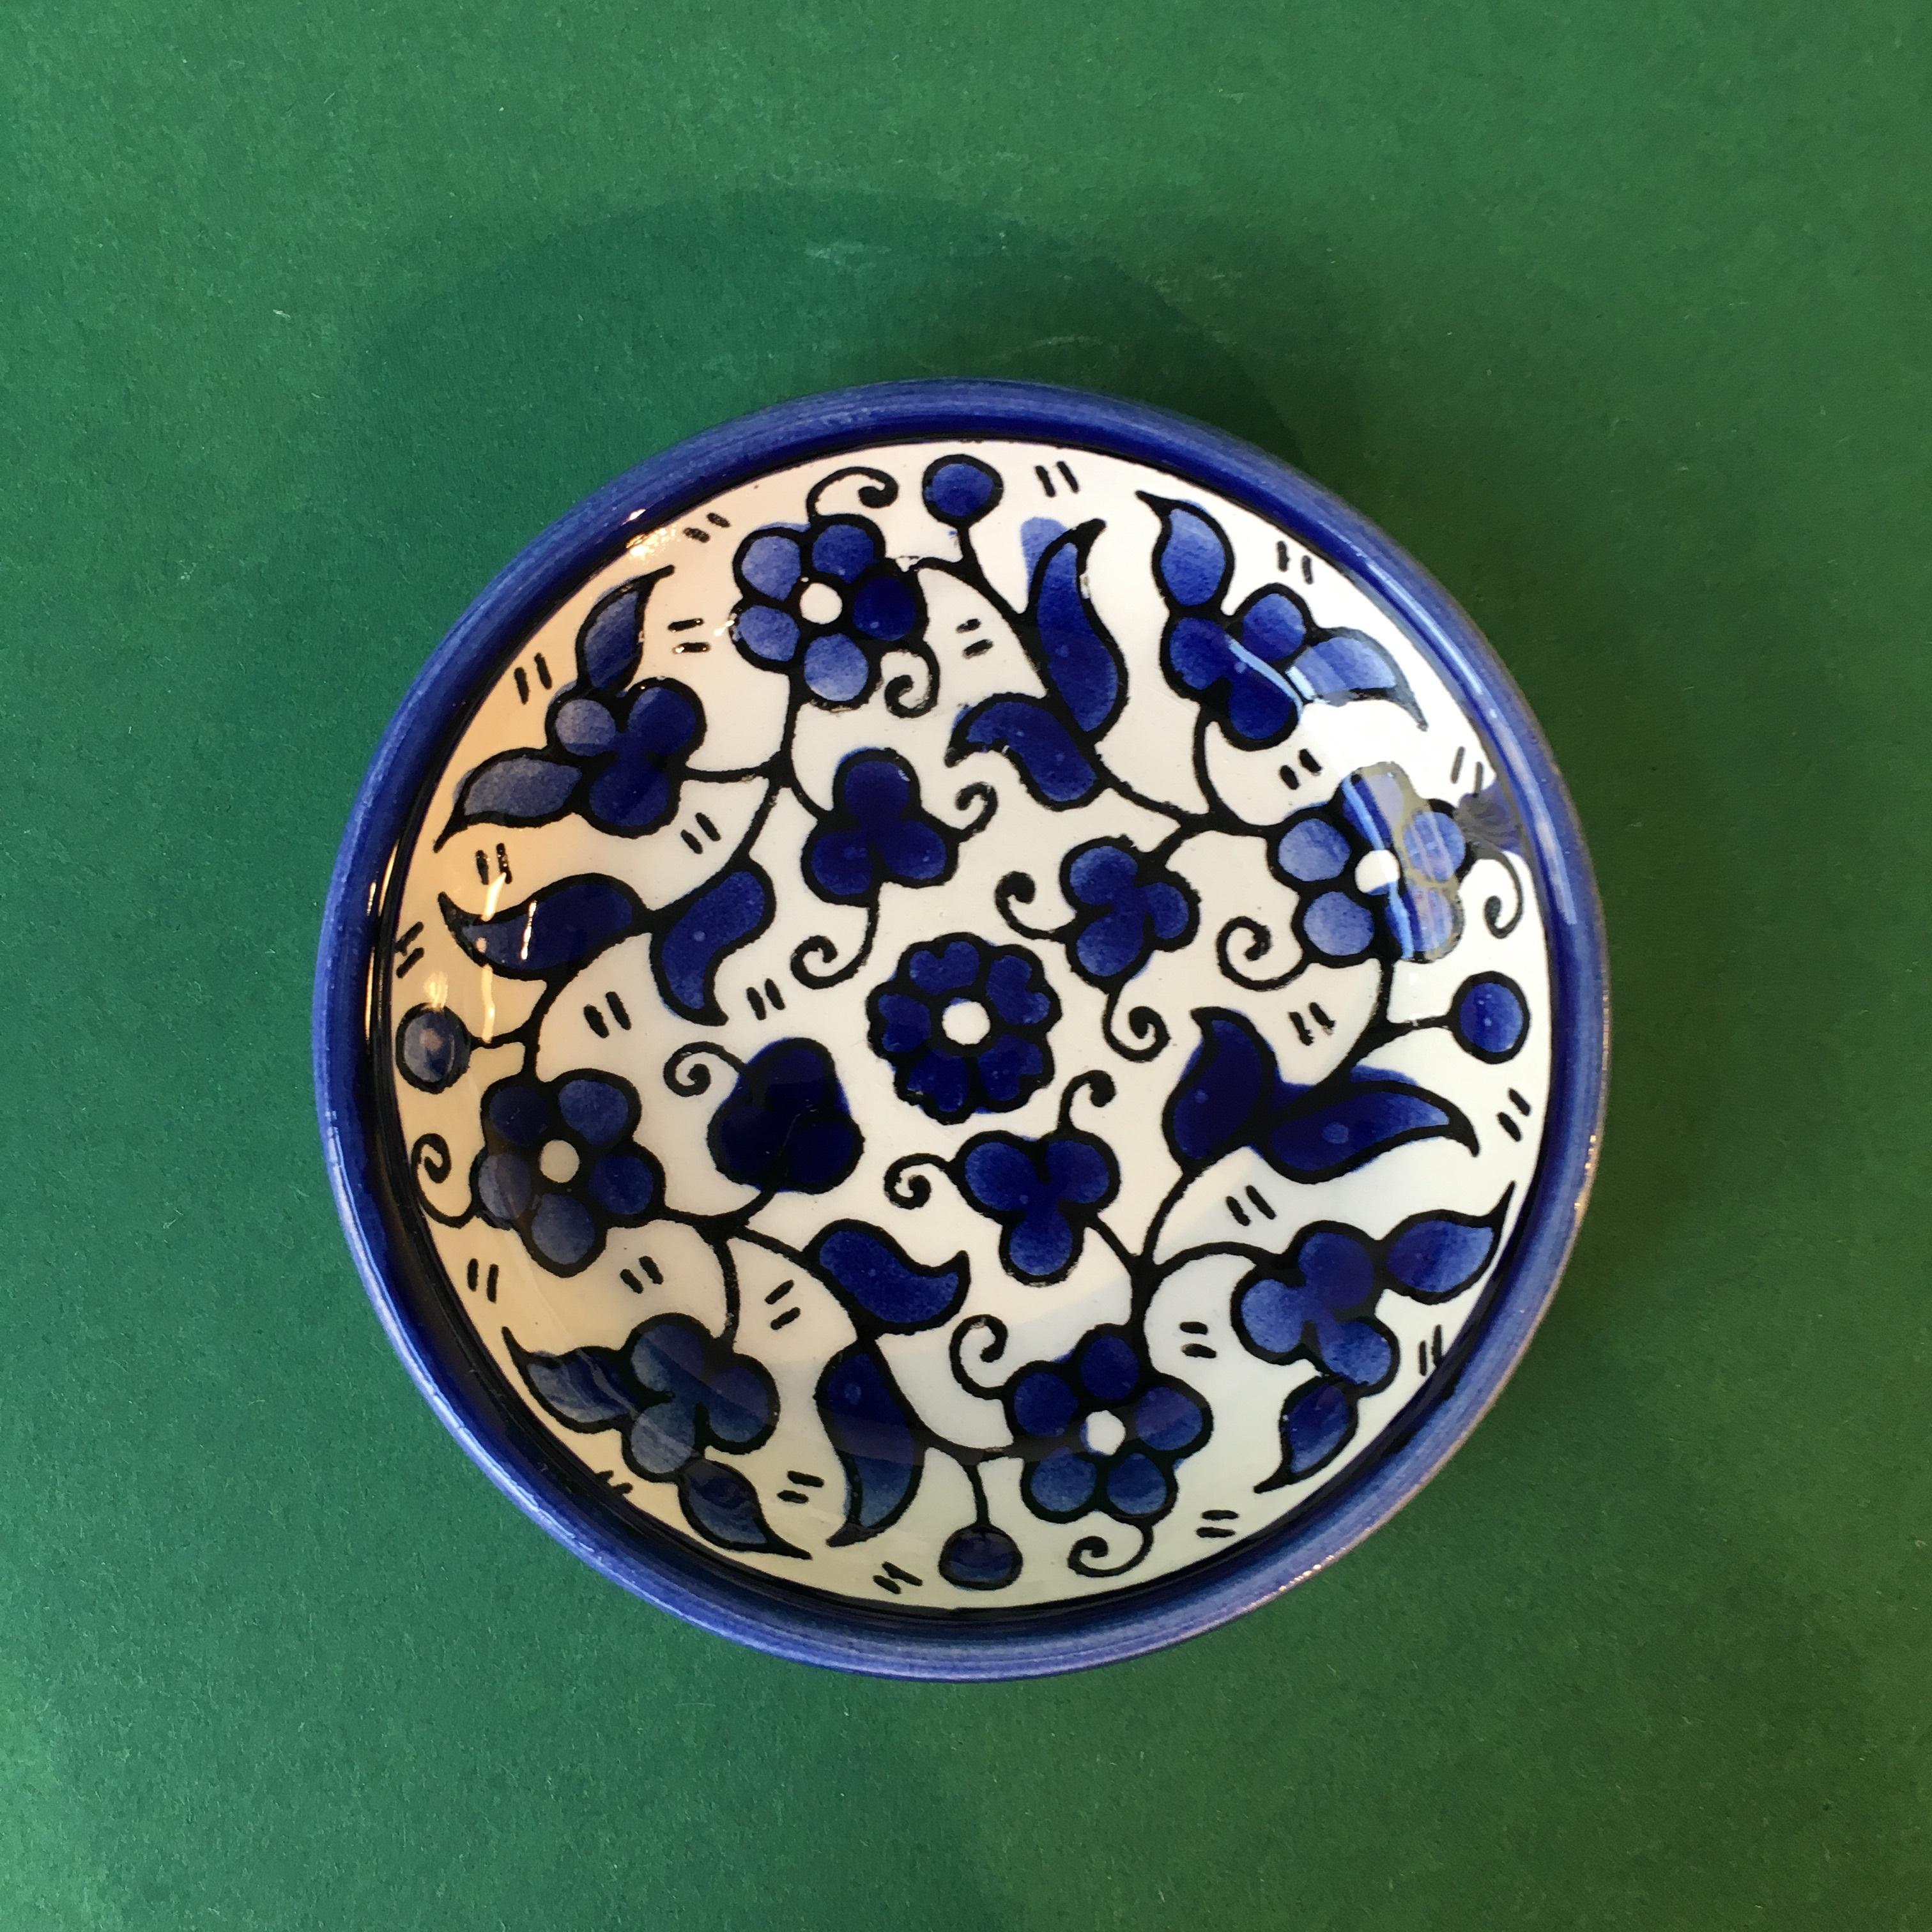 Mini keramikkskål, blå